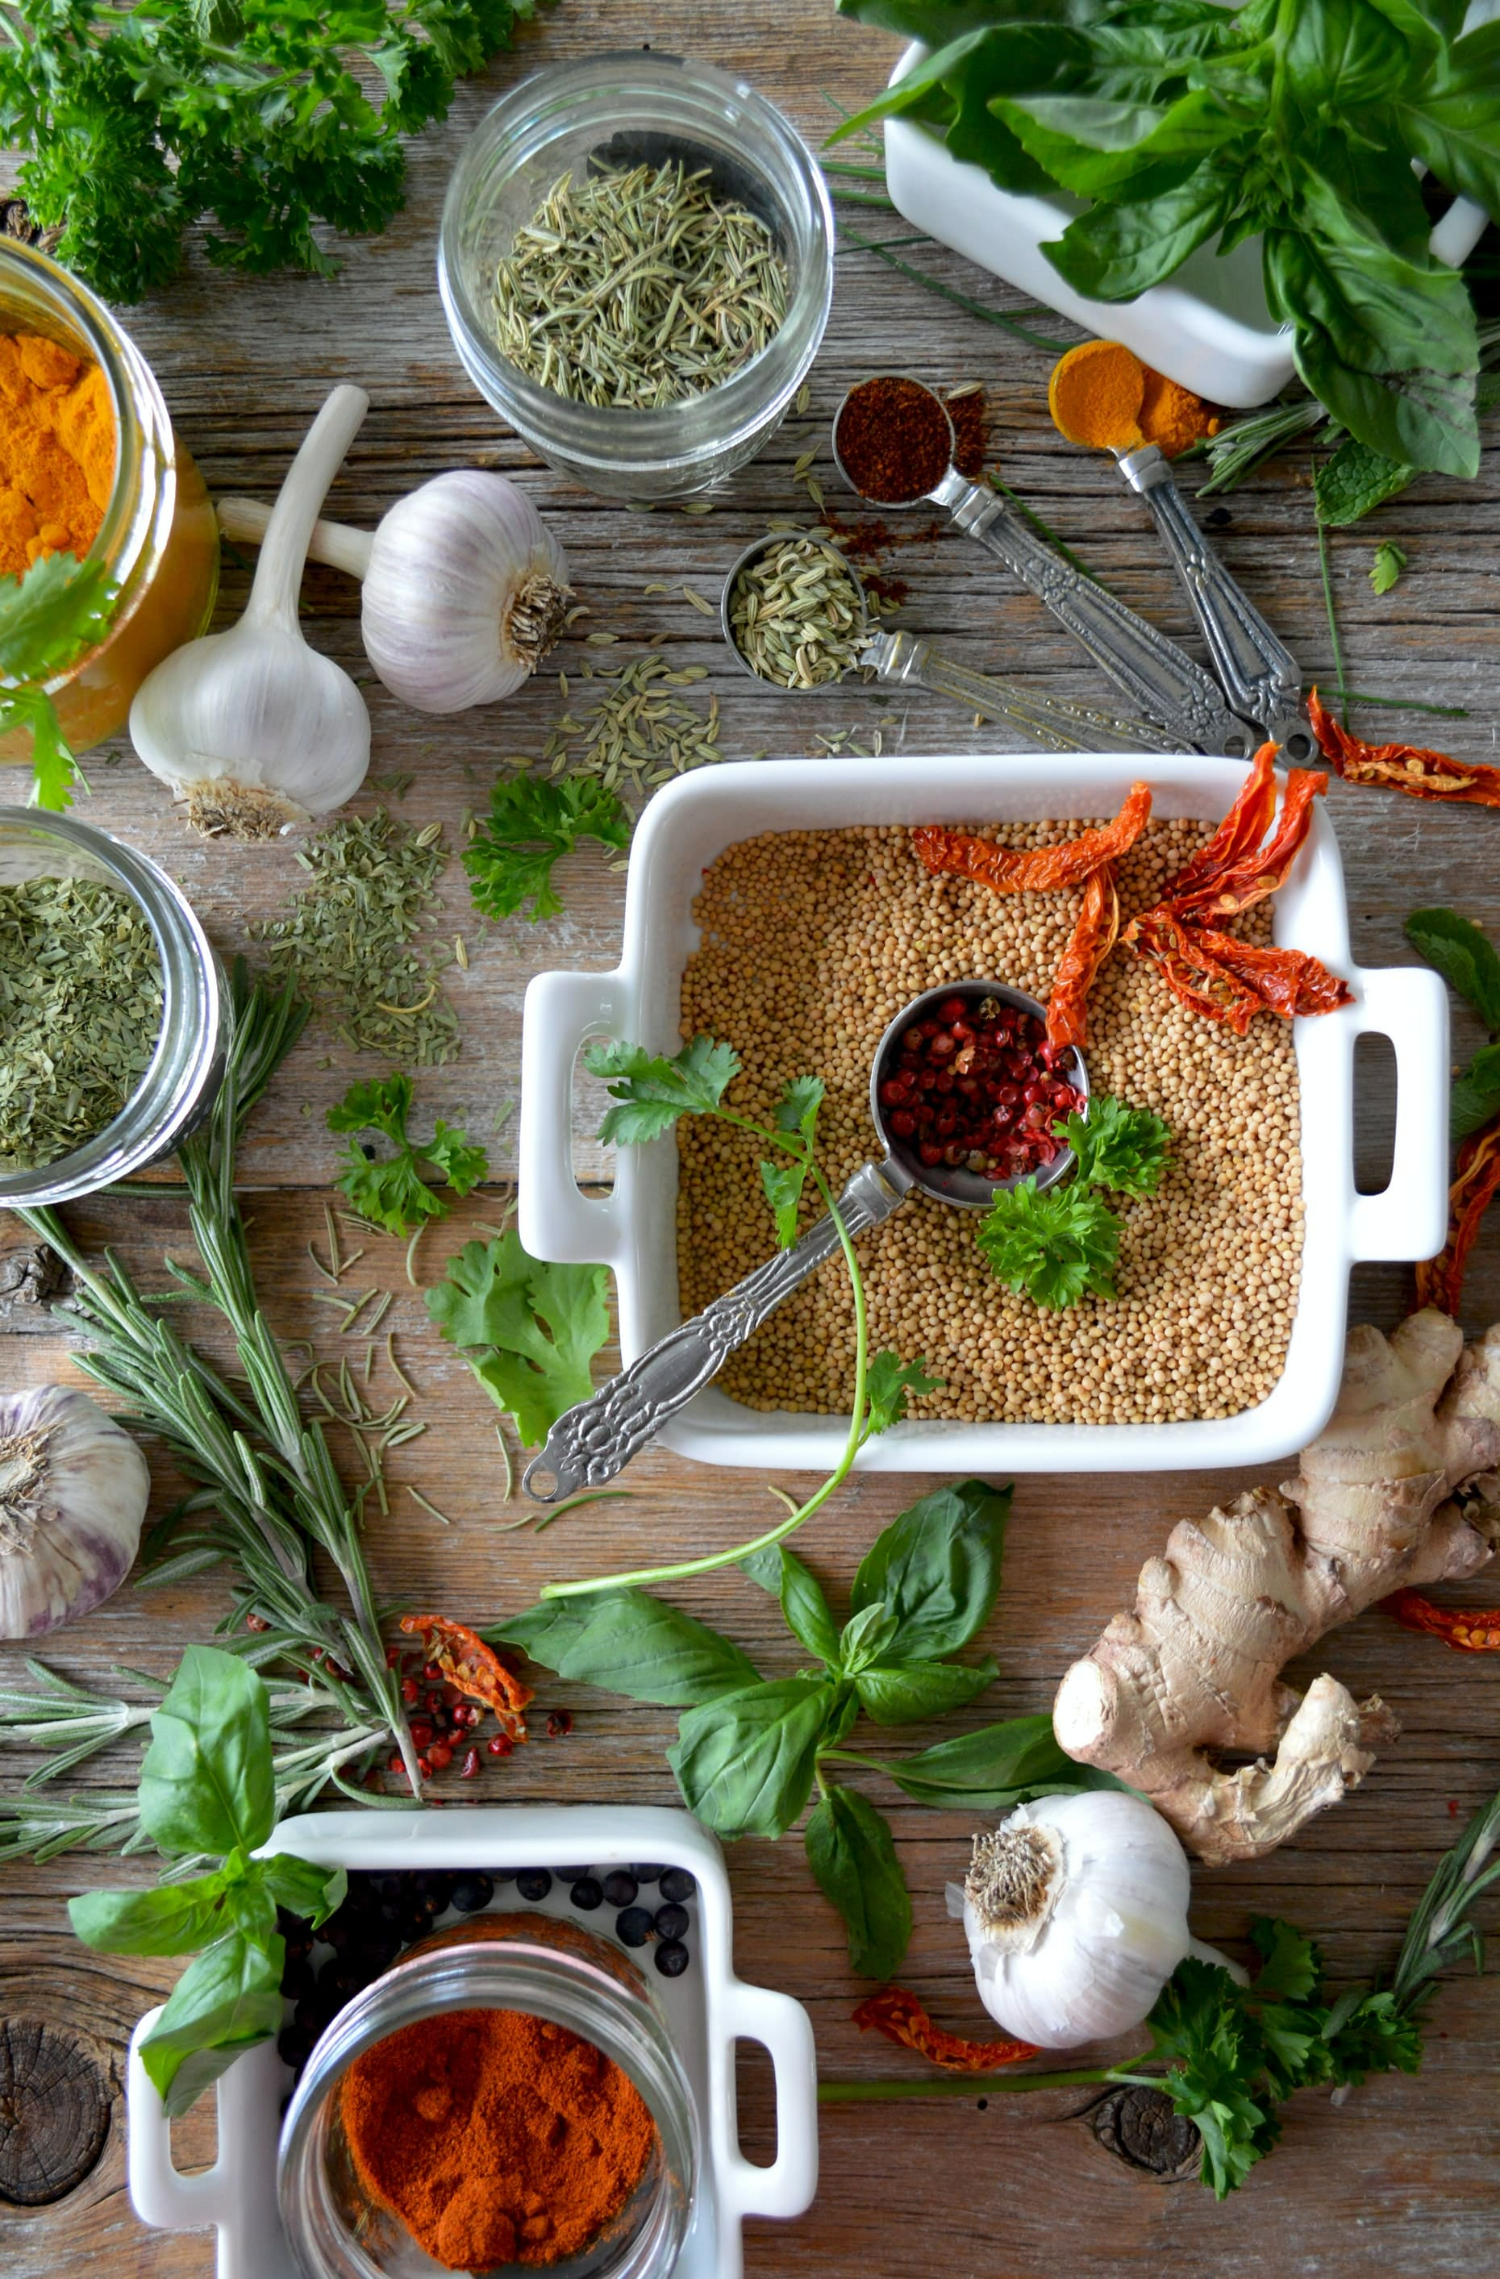 Vegan 1200 Calorie Diet Meal Plan for Beginners